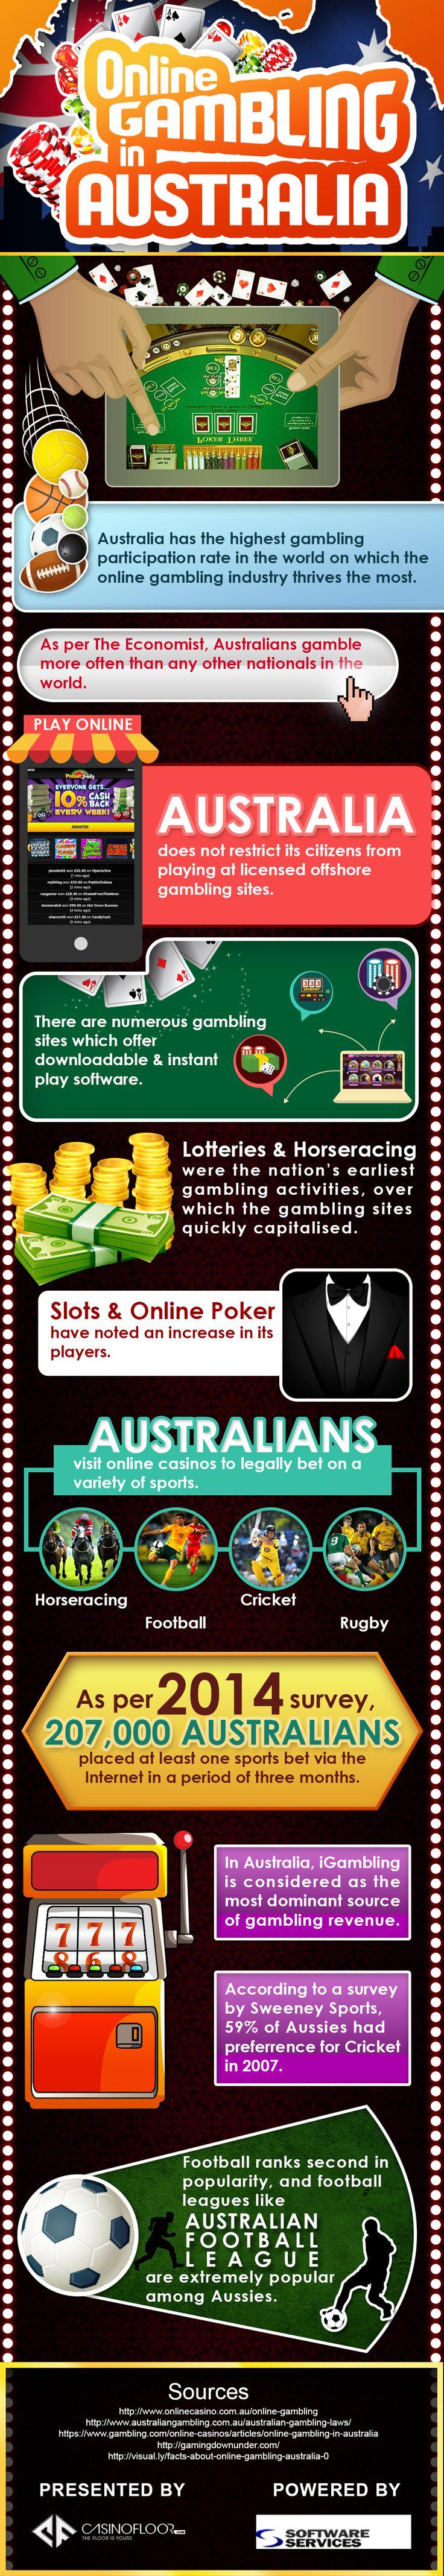 777-online-gambling.net define the casino gambling industry